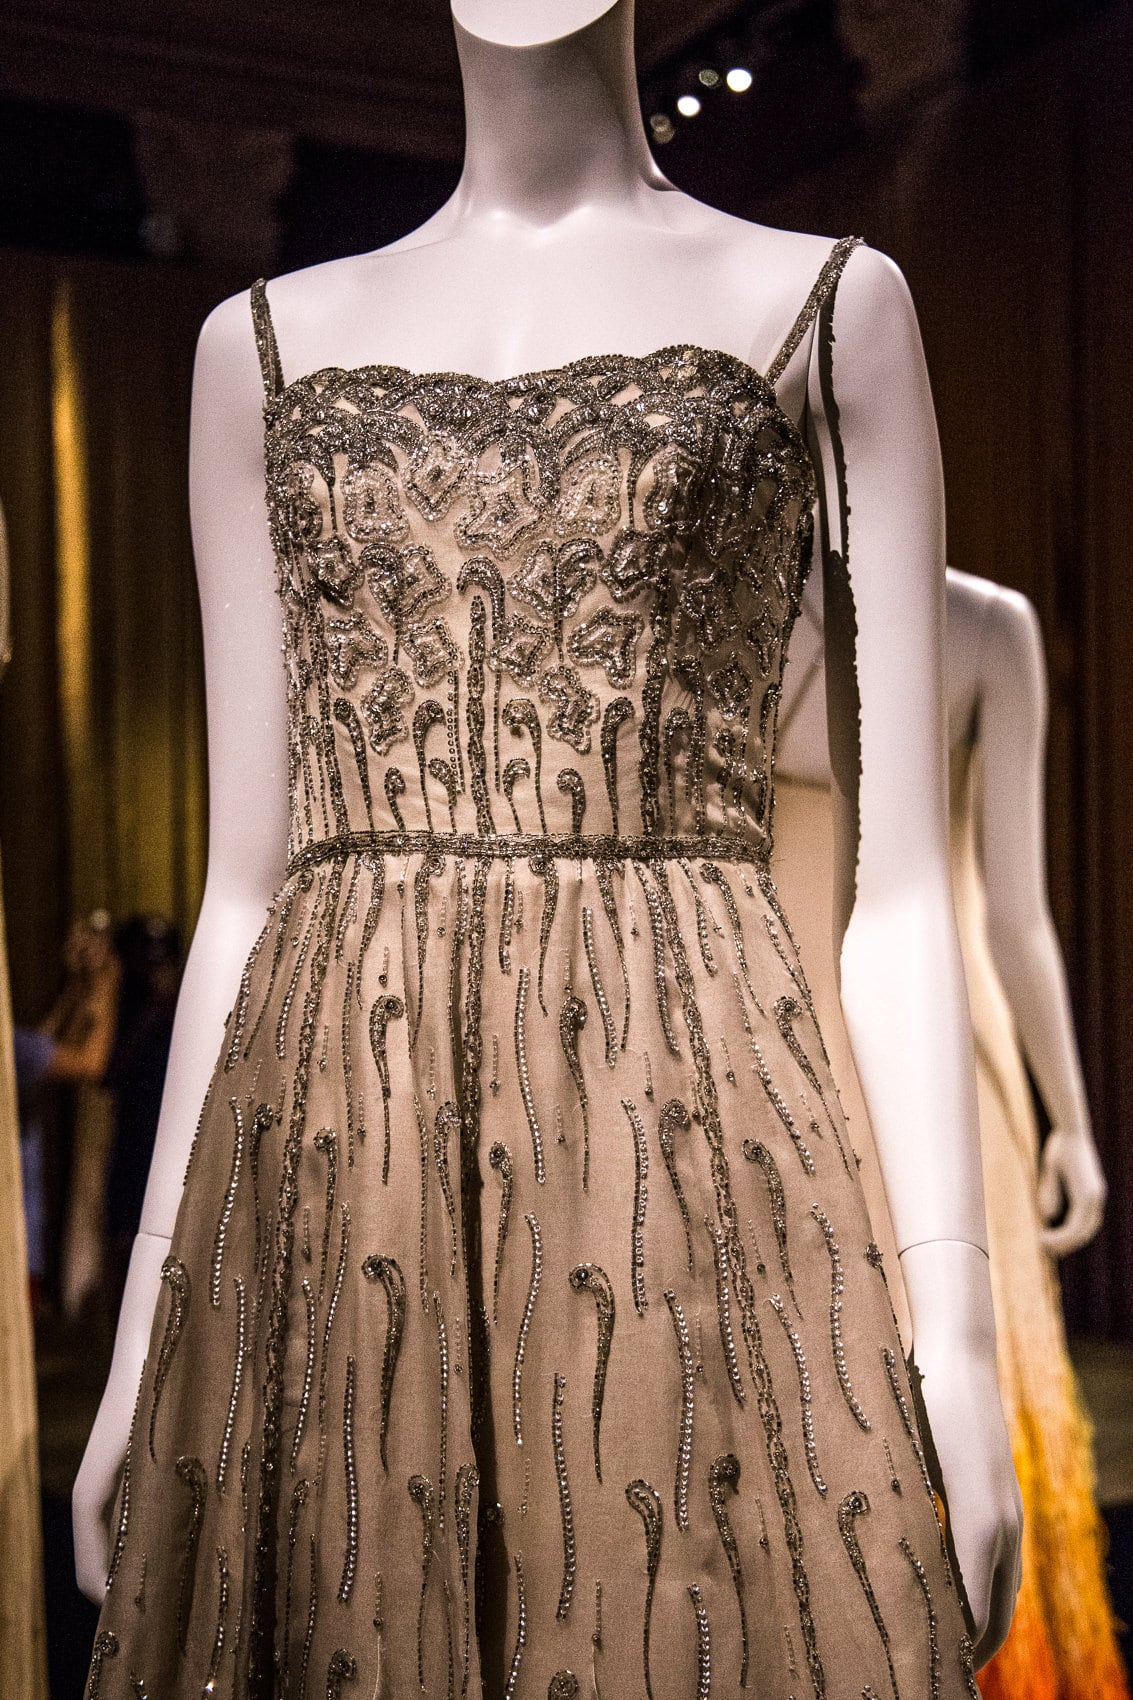 Palais Galliera - Dalida Ausstellung im Modemuseum in Paris